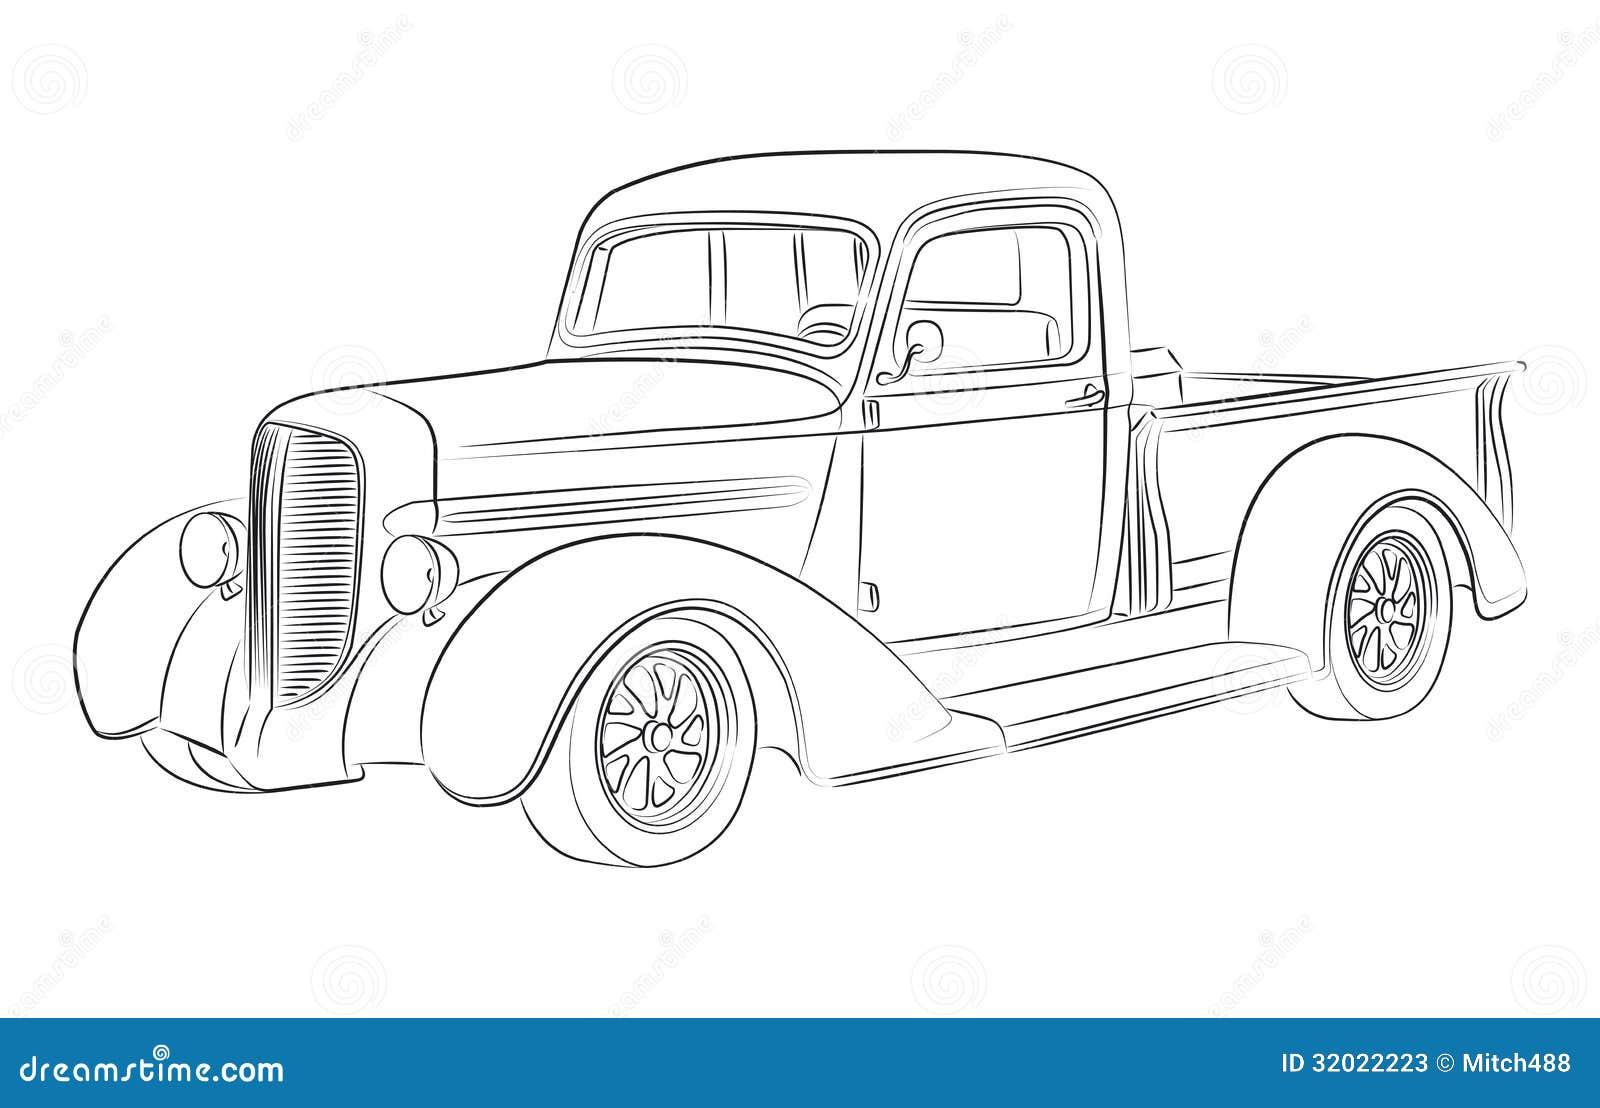 dibujo de la recogida de hotrod stock de ilustraci u00f3n